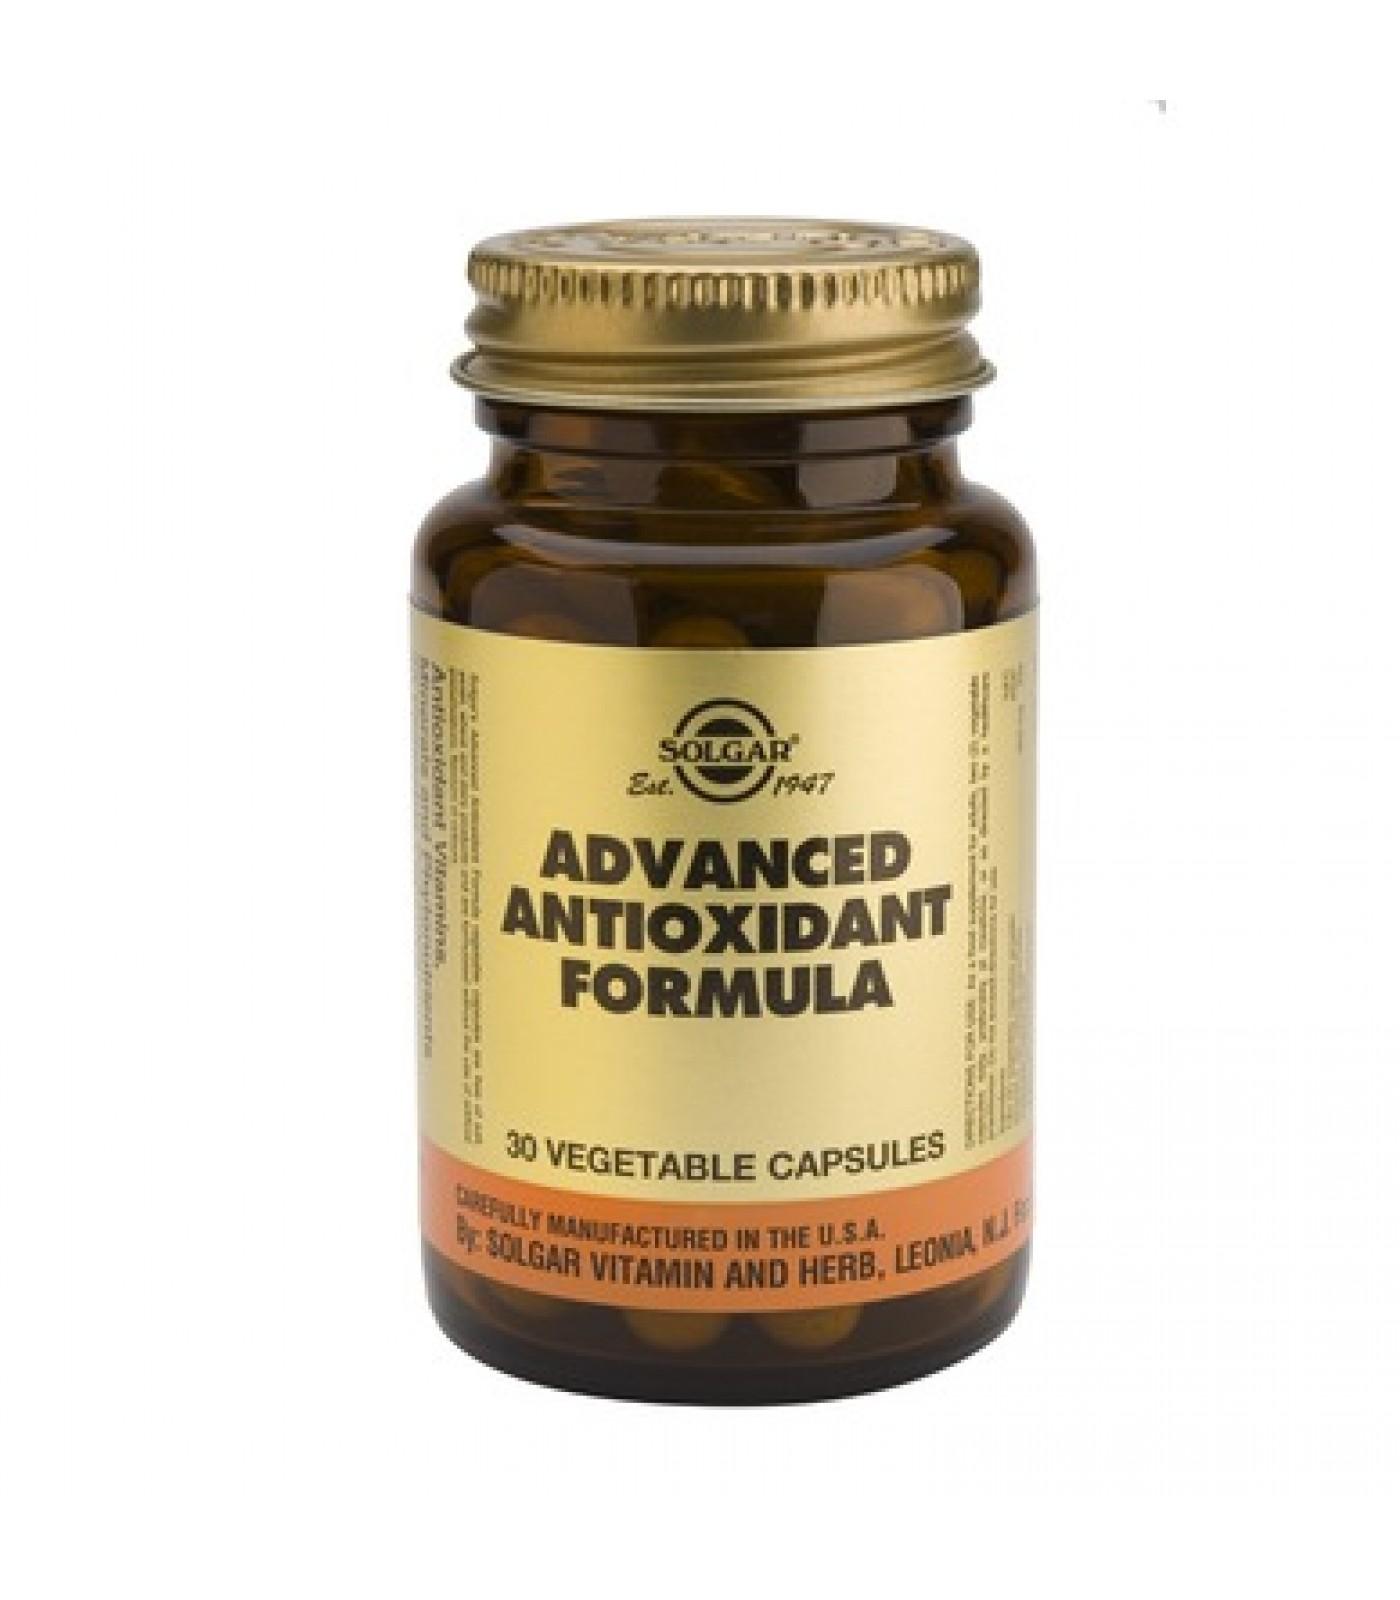 Solgar - Advanced Antioxidant Formula / 30 caps.